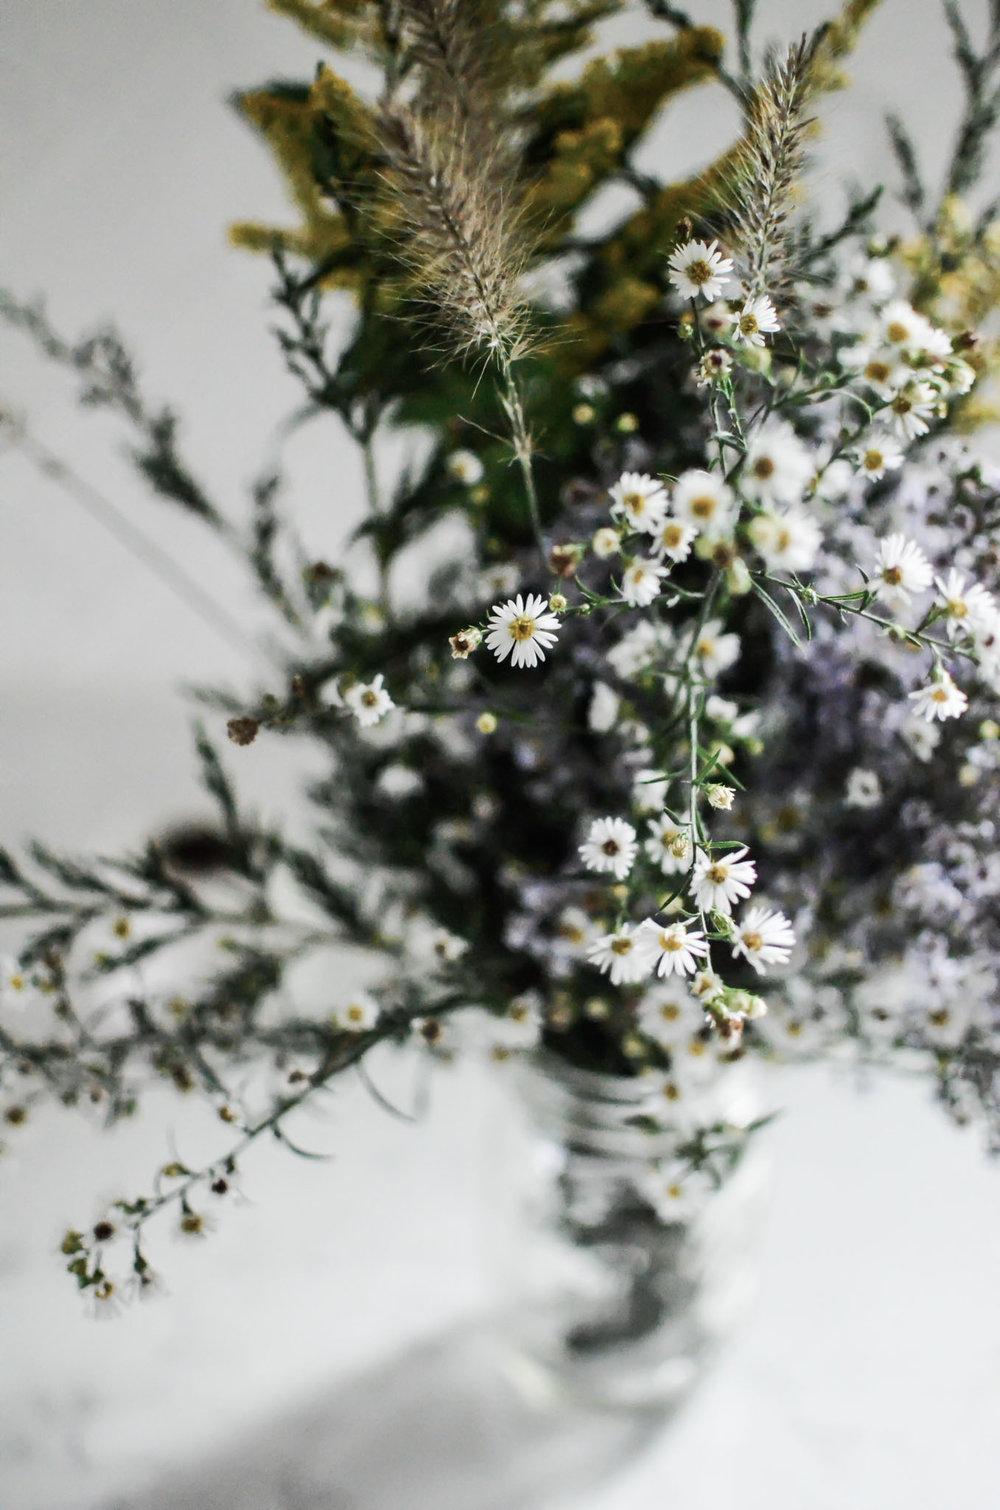 Wendling_Boyd__Wild_Flowers-6.jpg